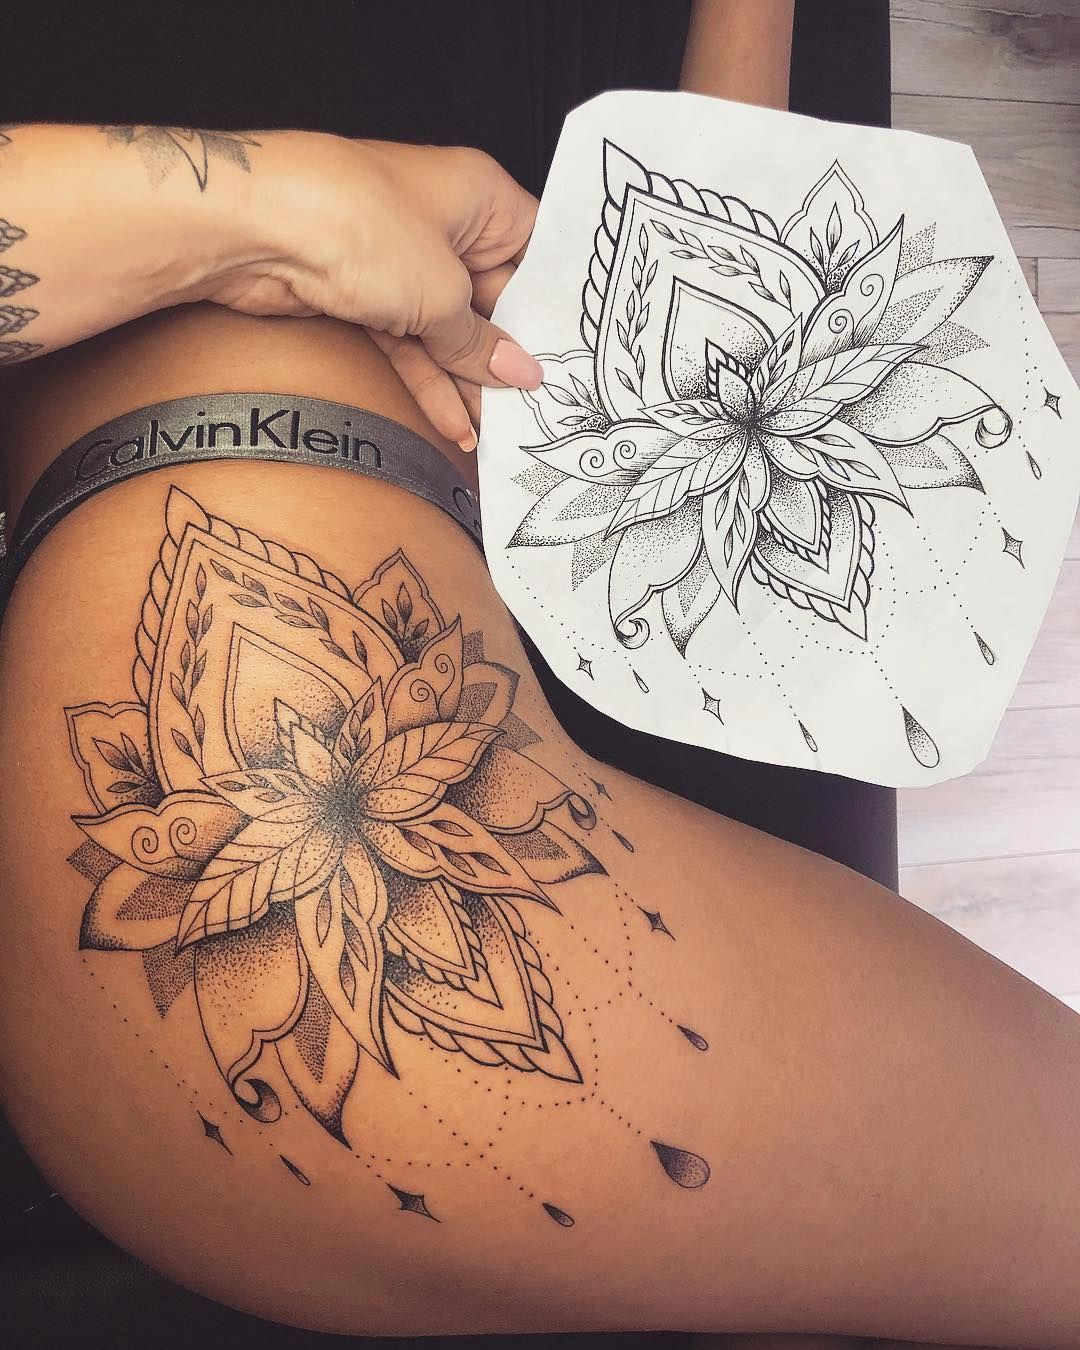 Mandala Style Tattoo Mandalatattoo Hip Thigh Tattoos Floral Thigh Tattoos Hip Tattoos Women